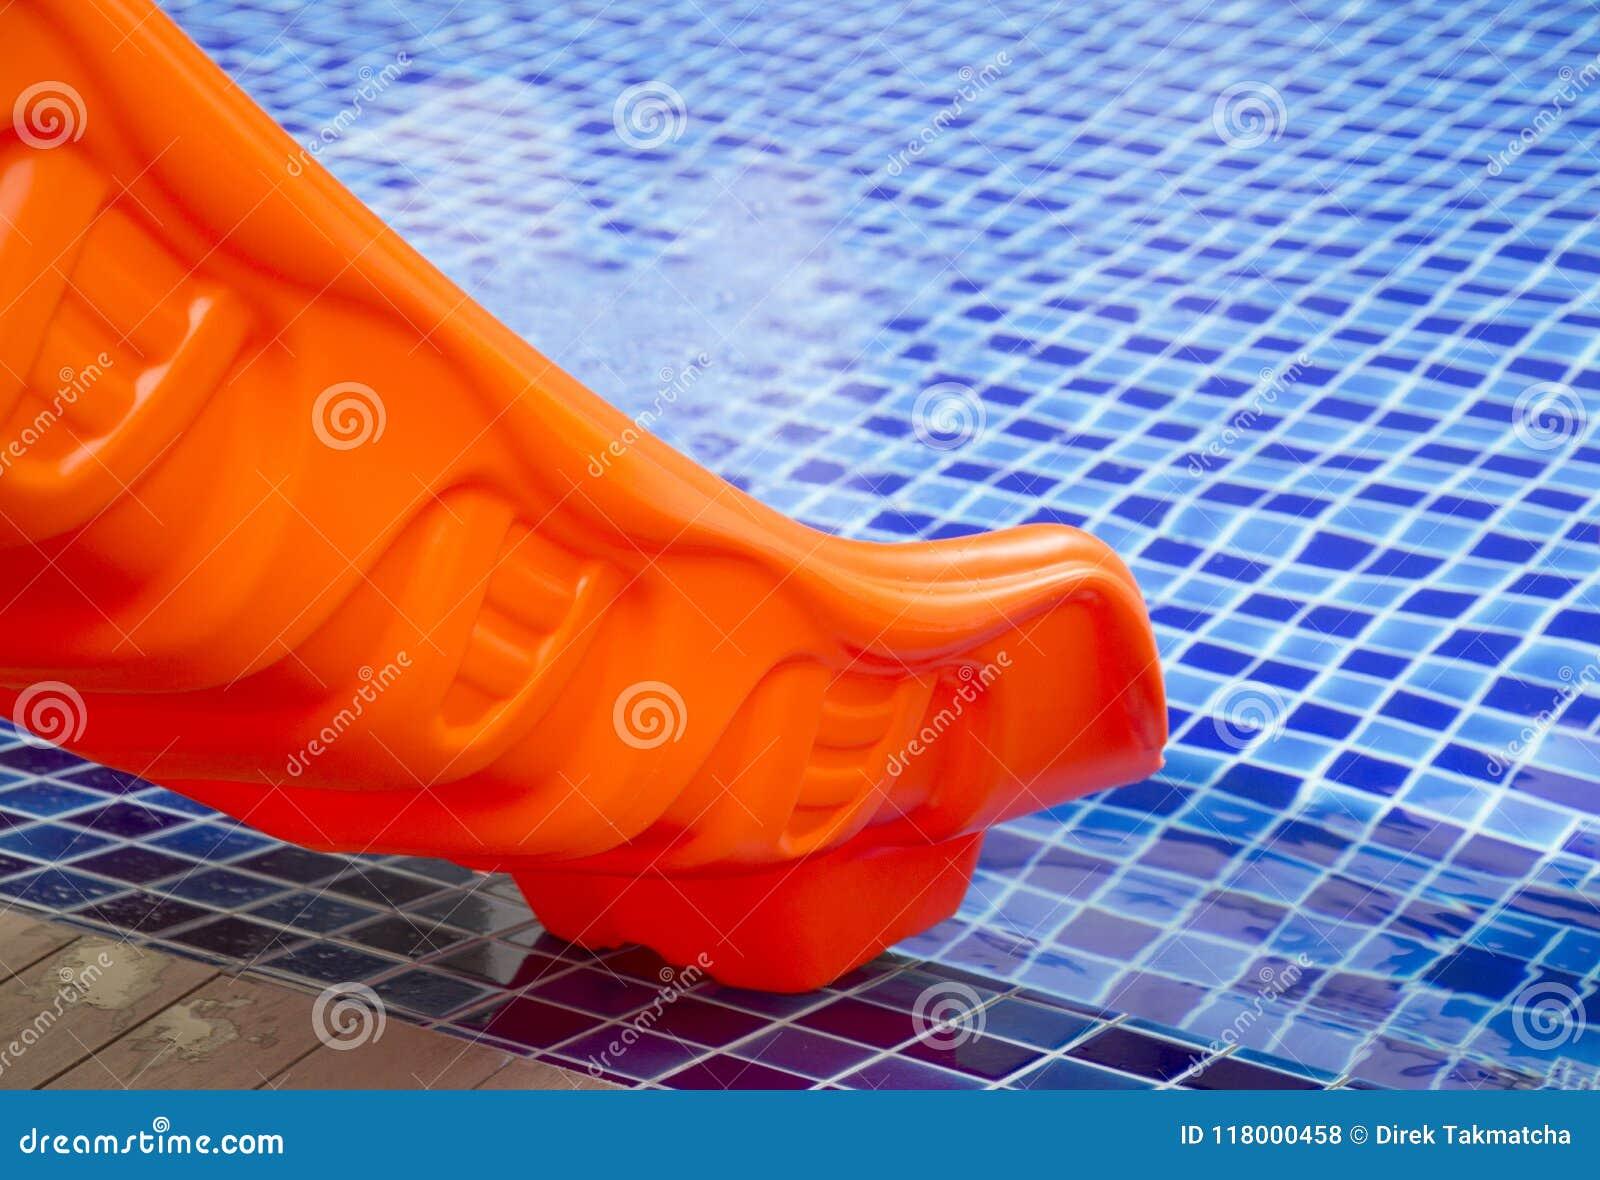 c9edd2eda59 Orange pool slider stock photo. Image of sport, slider - 118000458